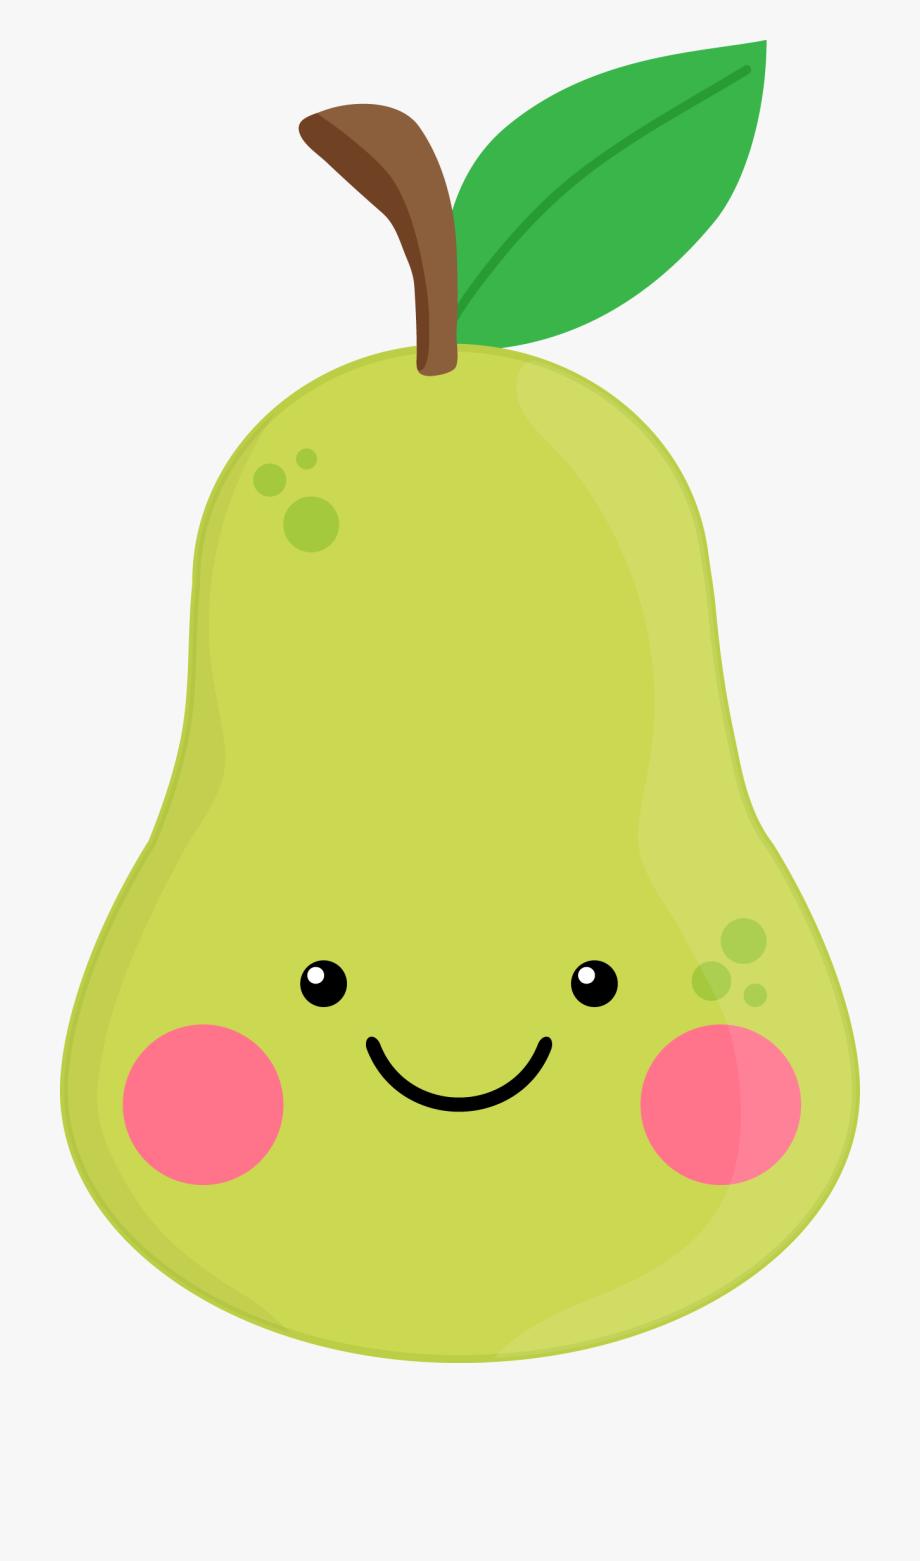 Pear clipart cute. Blueberry fruit clip art